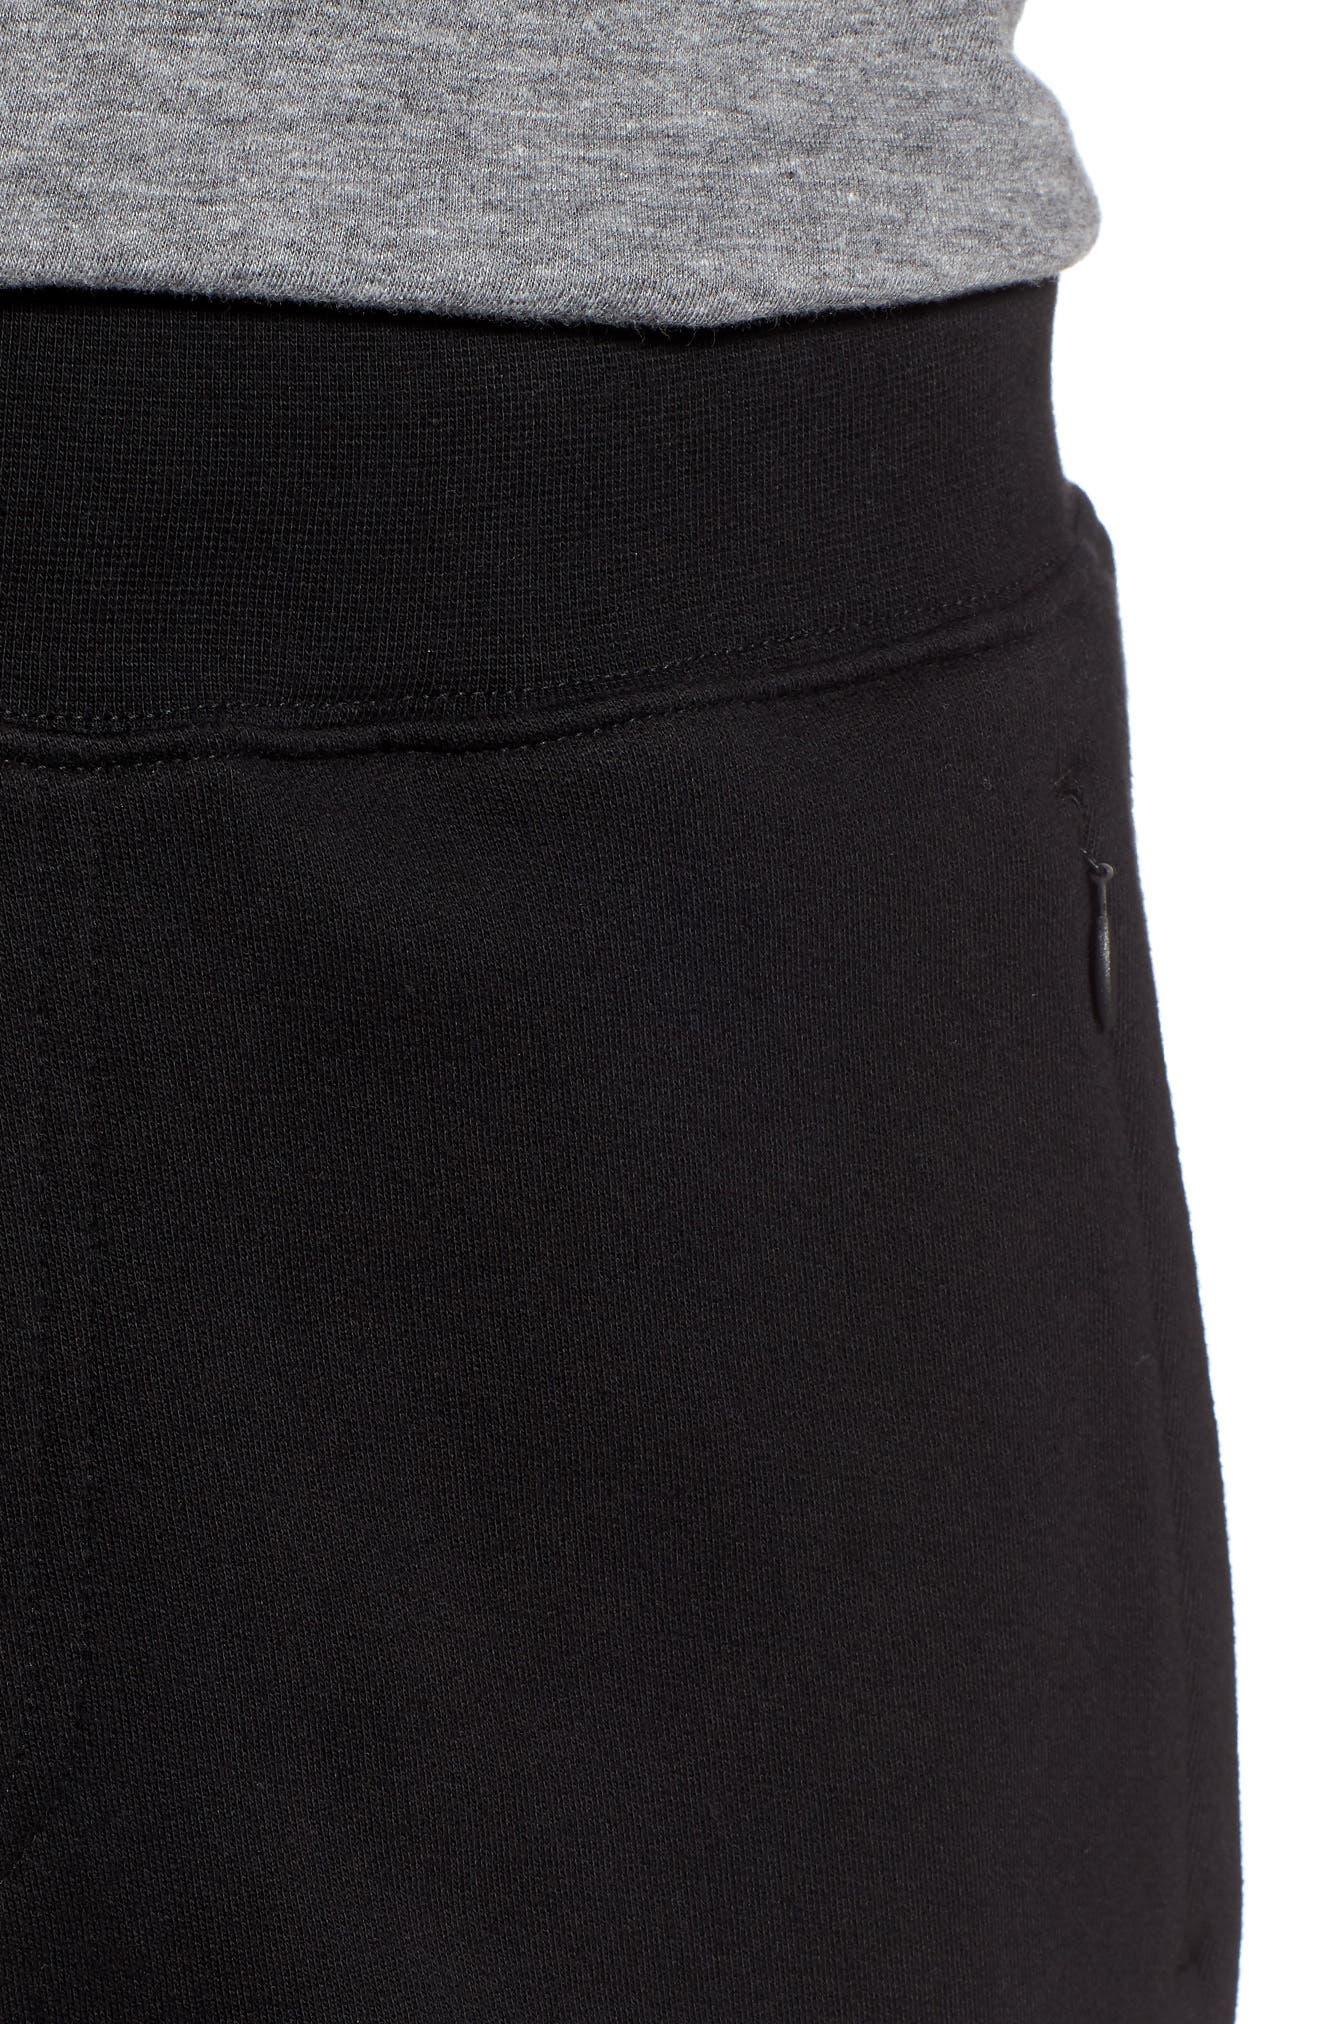 Core Jogger Pants,                             Alternate thumbnail 4, color,                             001